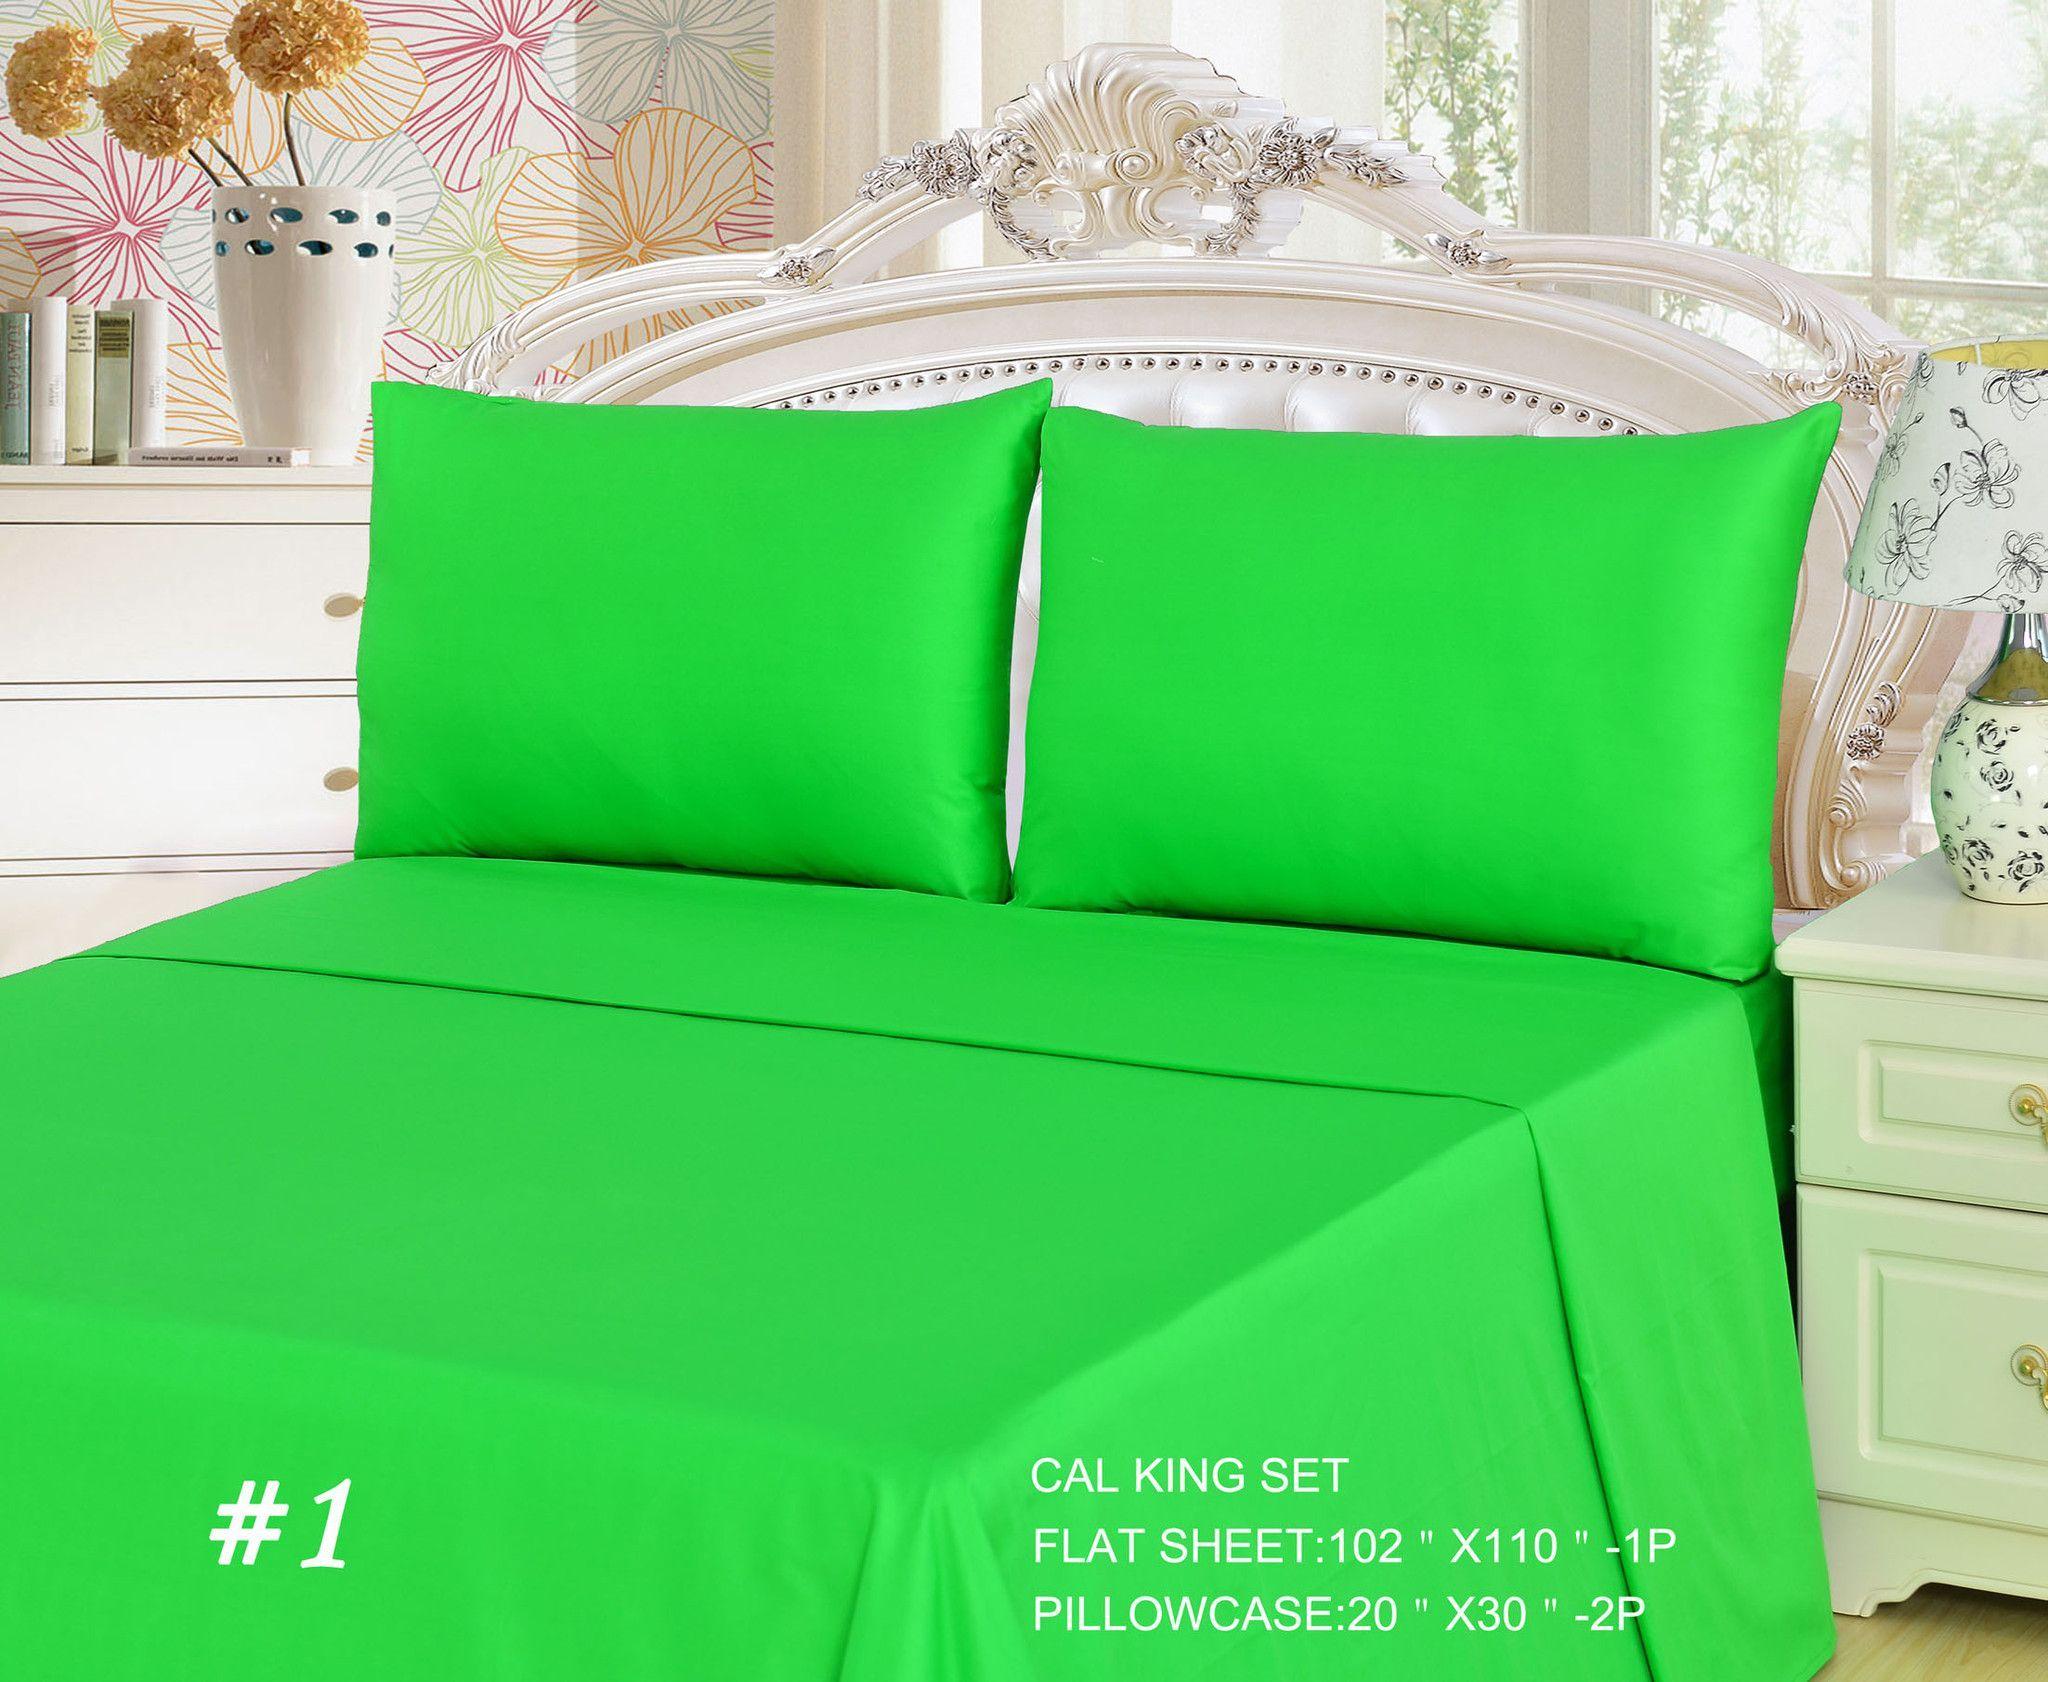 Tache 2 3 Piece Cotton Solid Lime Green Bed Sheet Flat Sheet